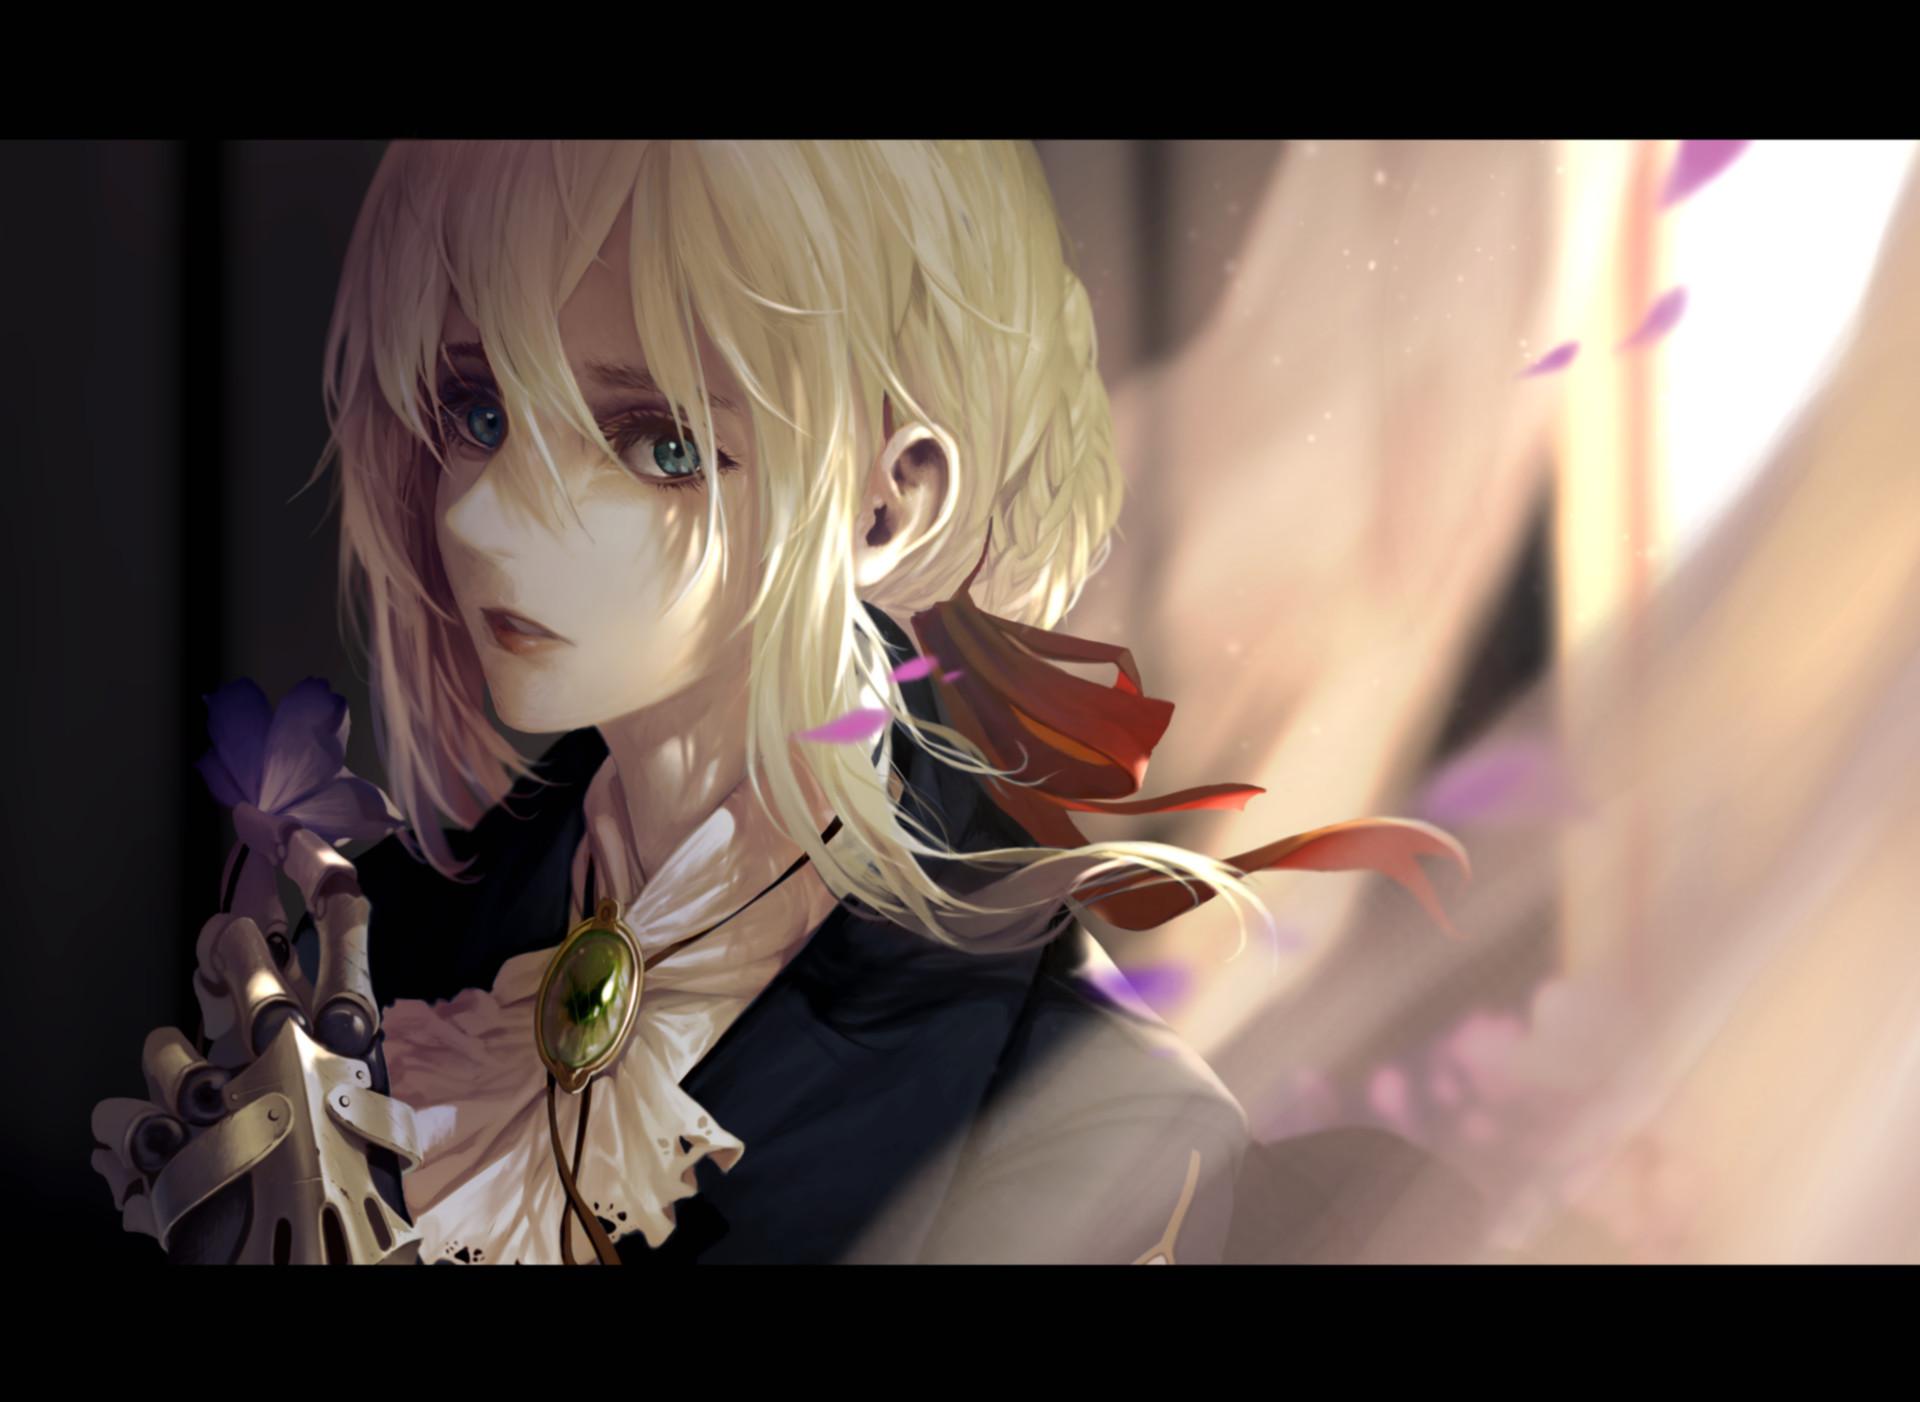 Bach do violethd2